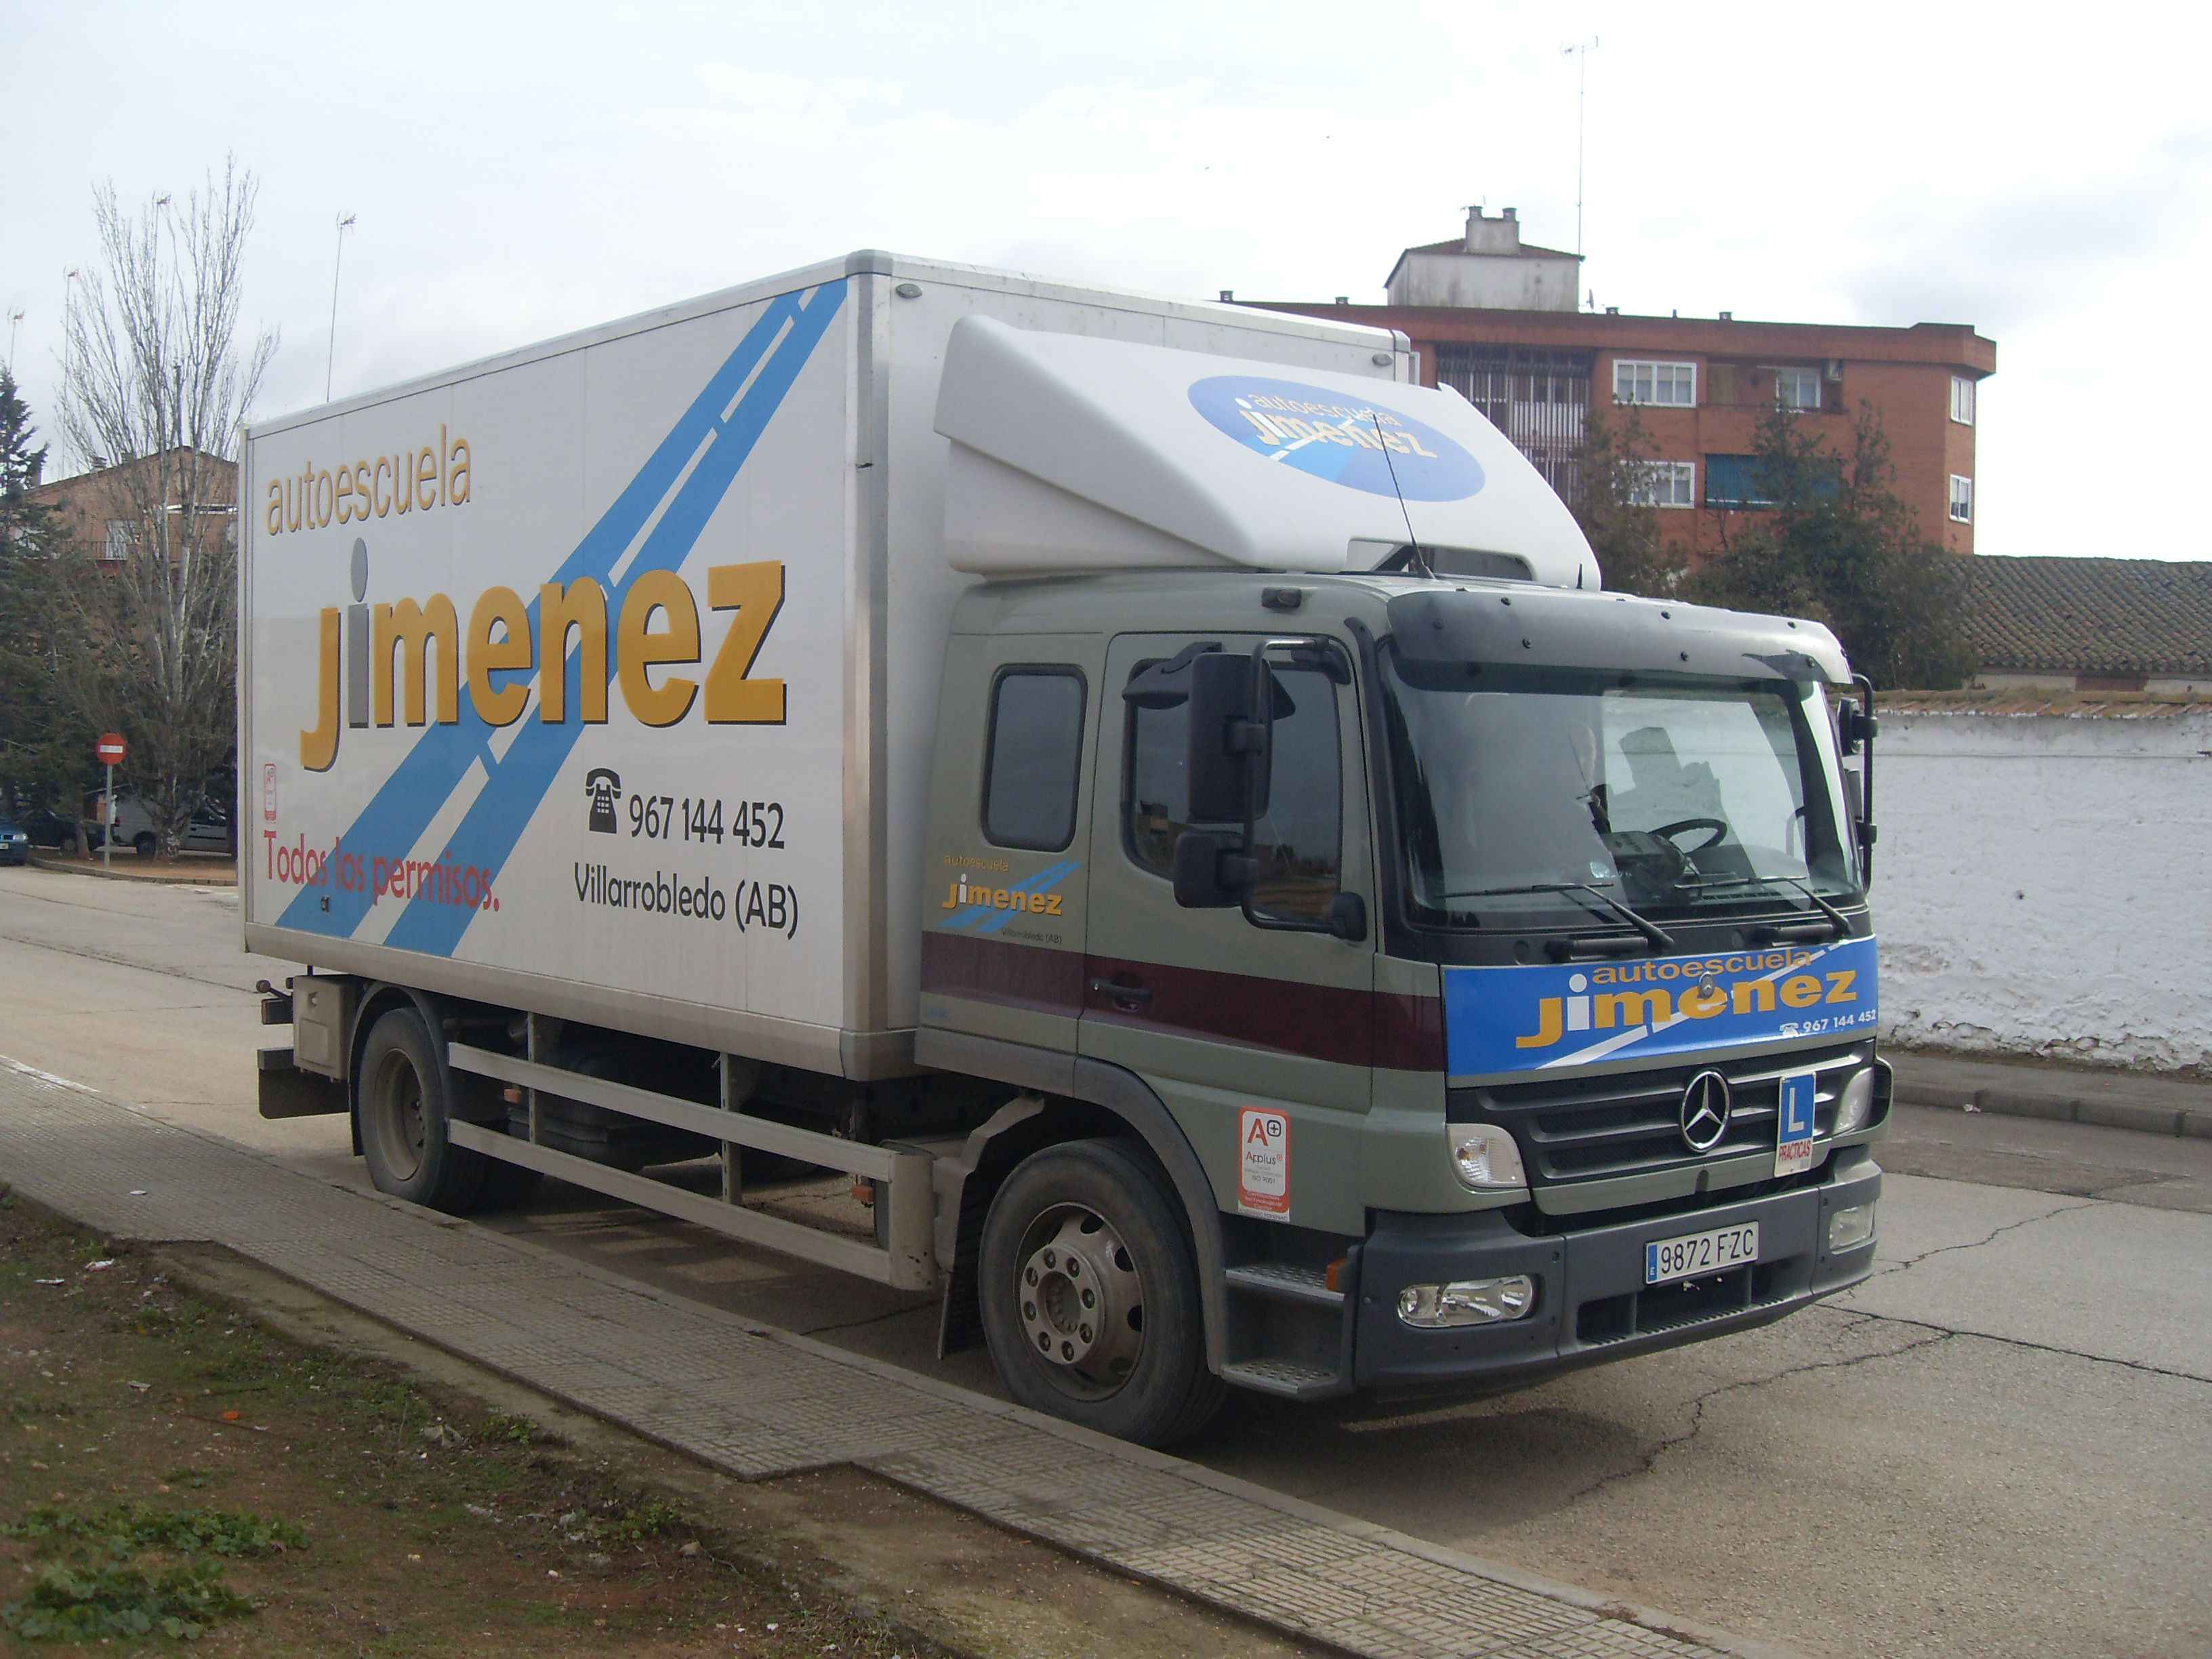 Carnet camión Villarrobledo